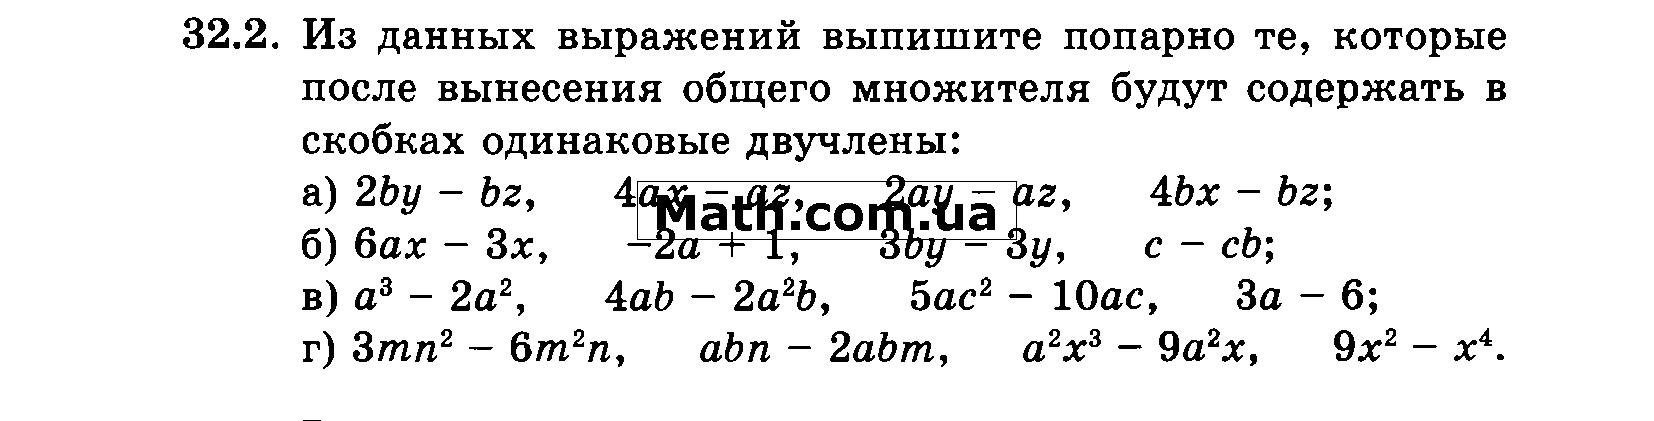 По алгебре 32.2 гдз